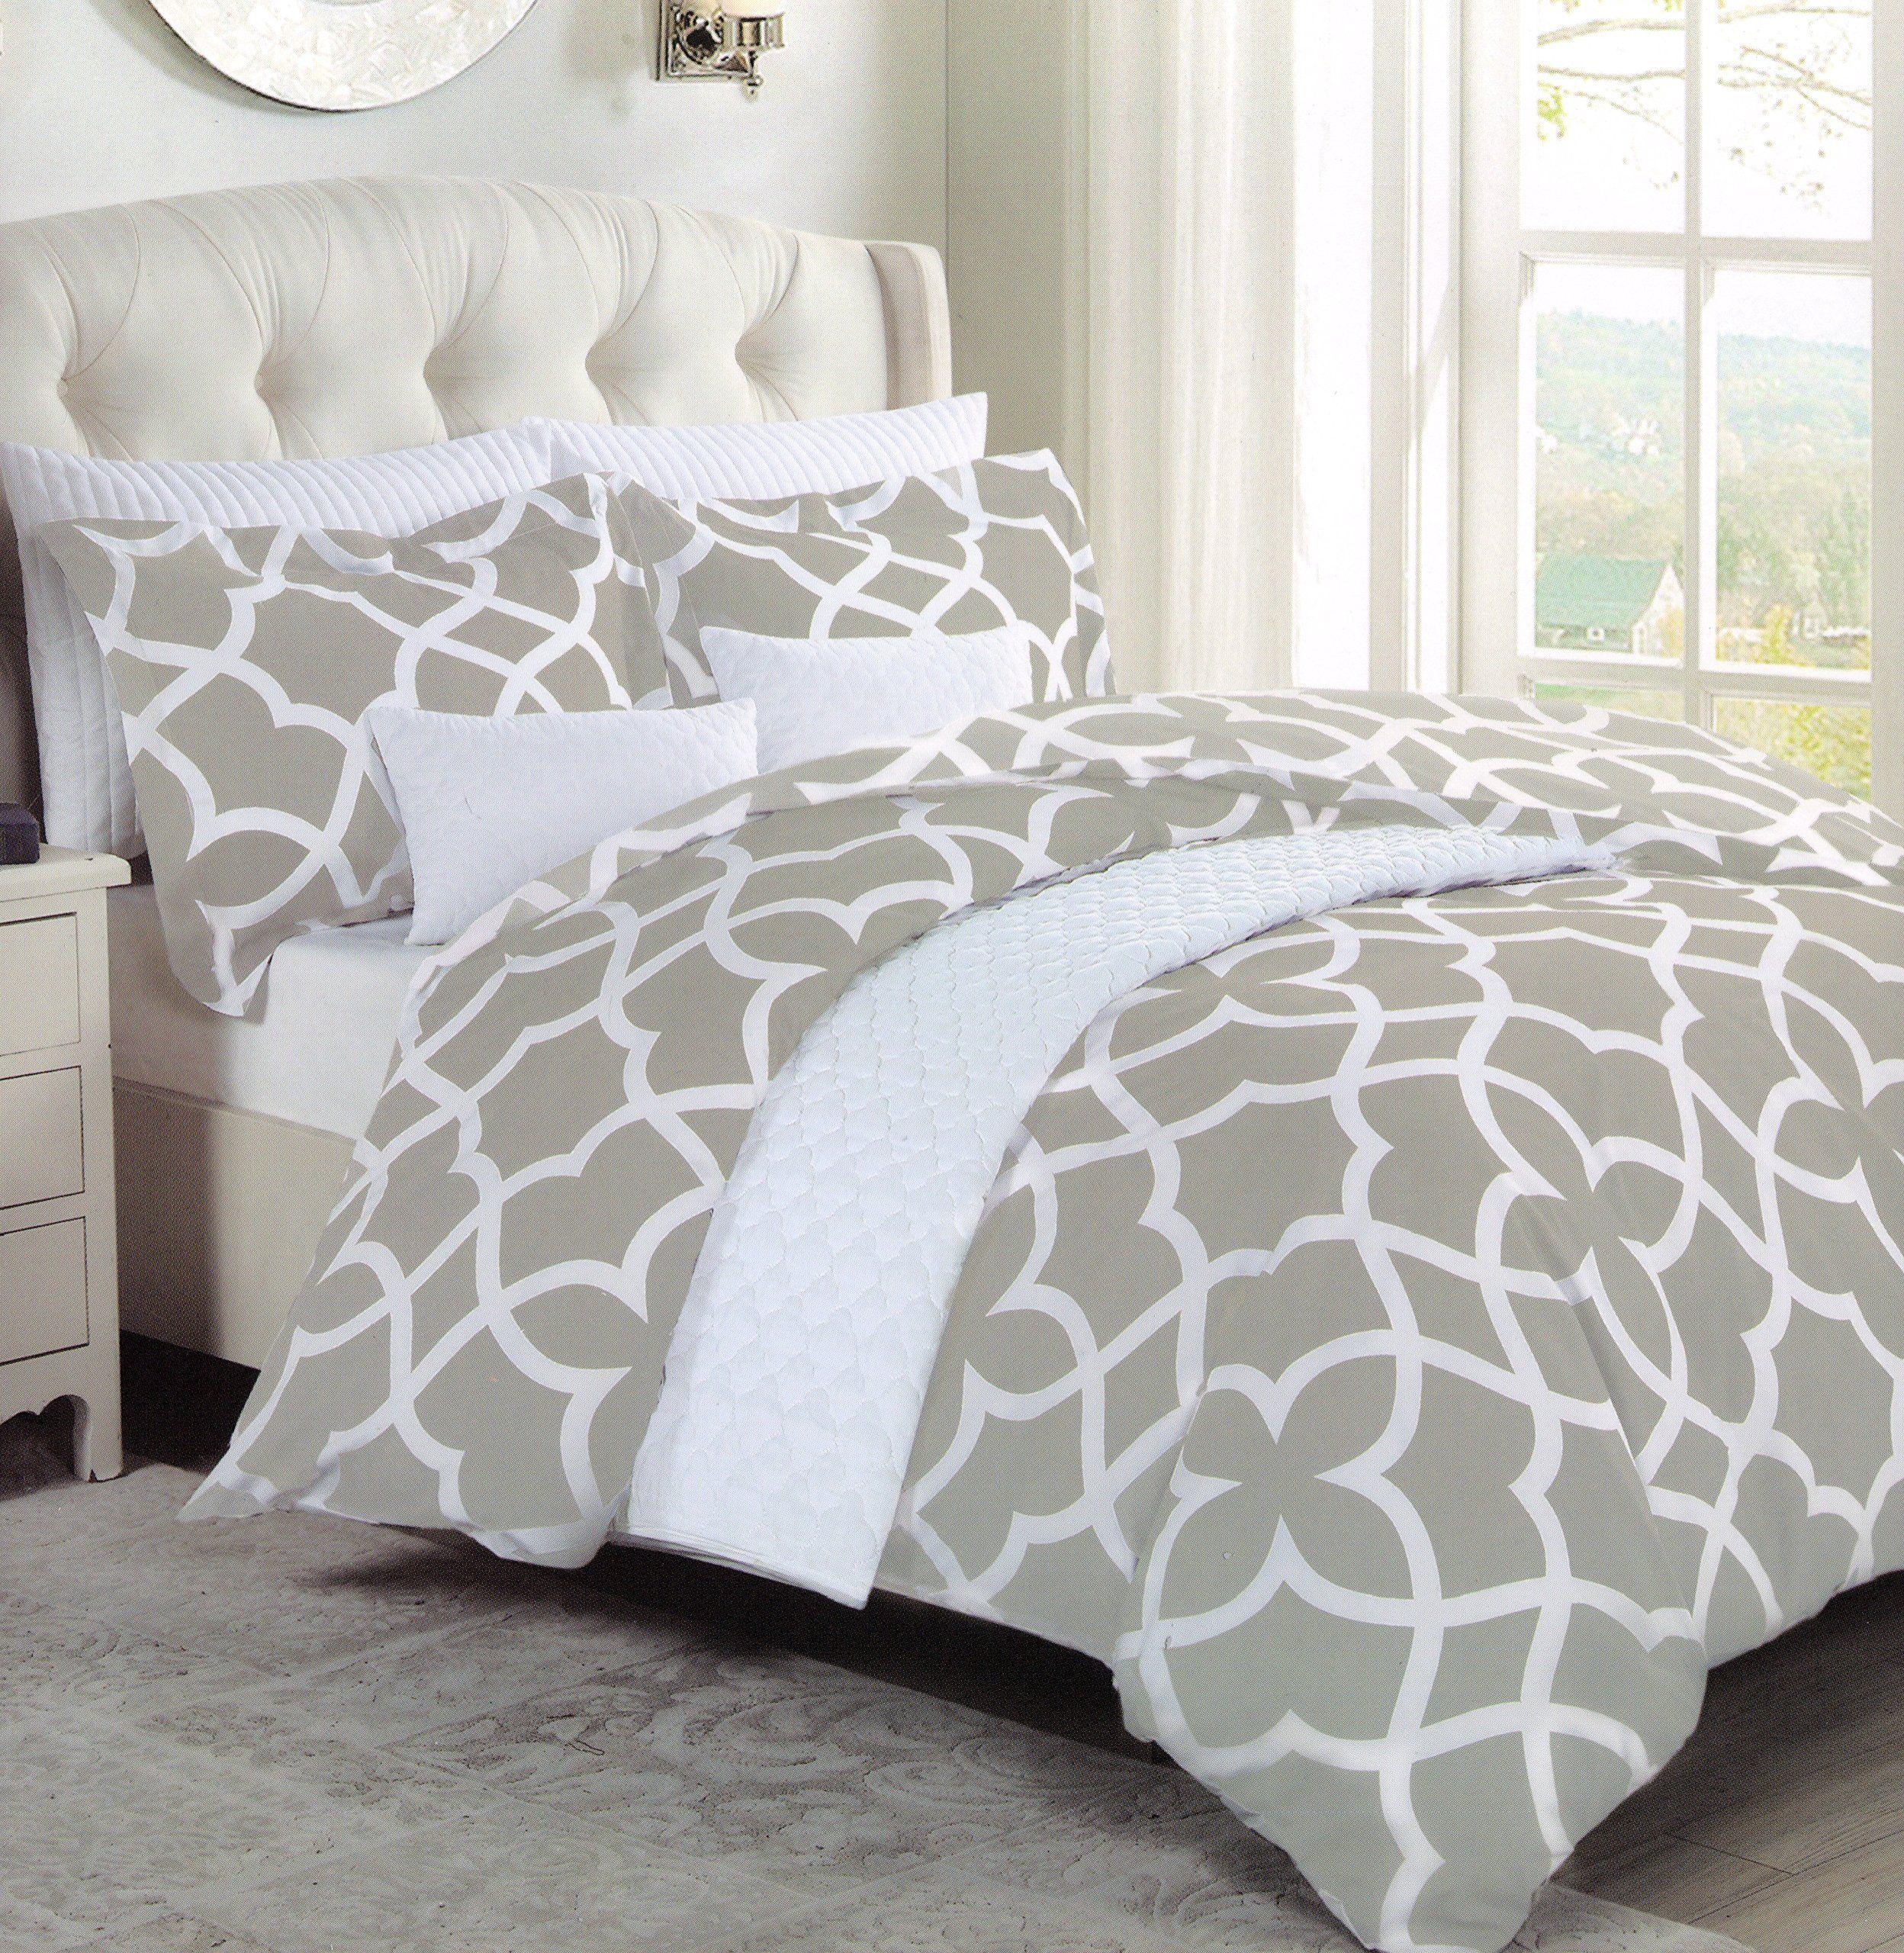 com studio max walmart in air built queen with bedding beautyrest raised pump aire mattress memory bed simmons ip